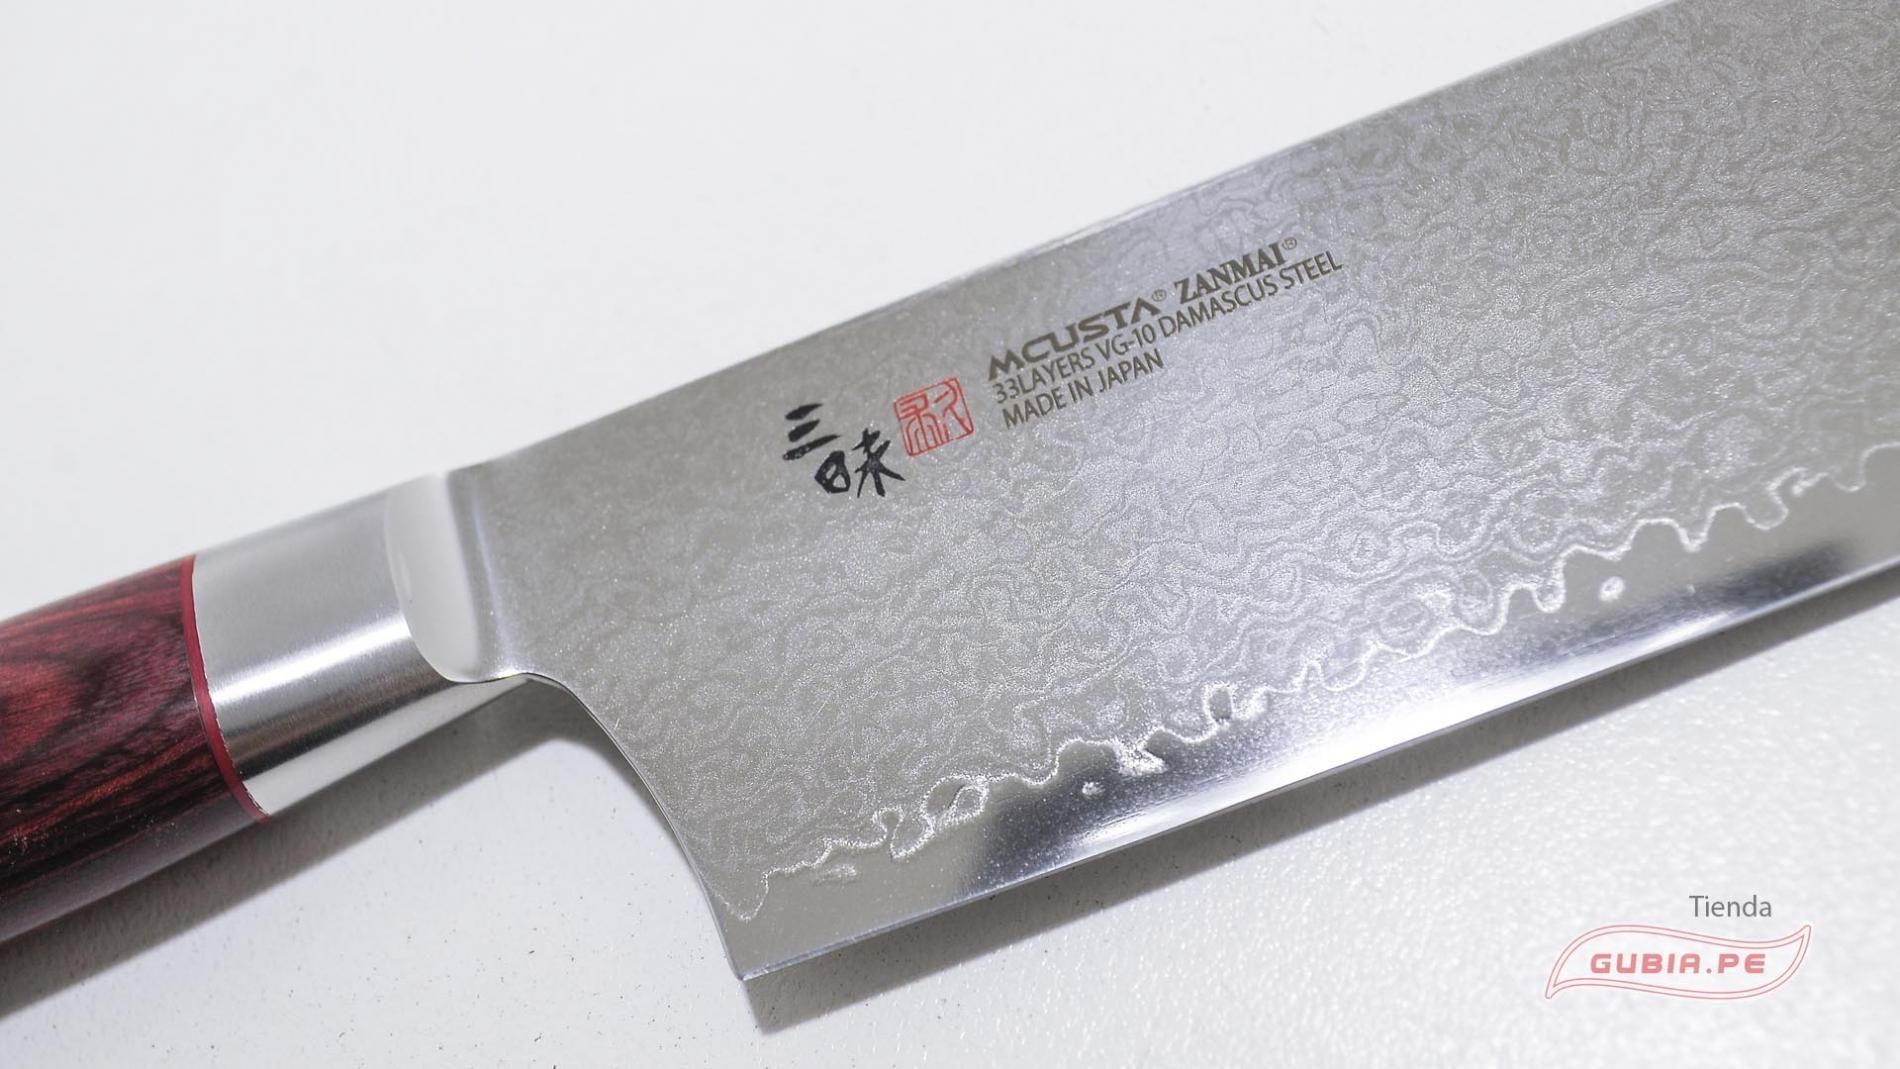 HFR-8008D-Cuchillo Nakiri 16.5cm acero VG10 Classic Pro Damascus Zanmai HFR-8008D-max-2.